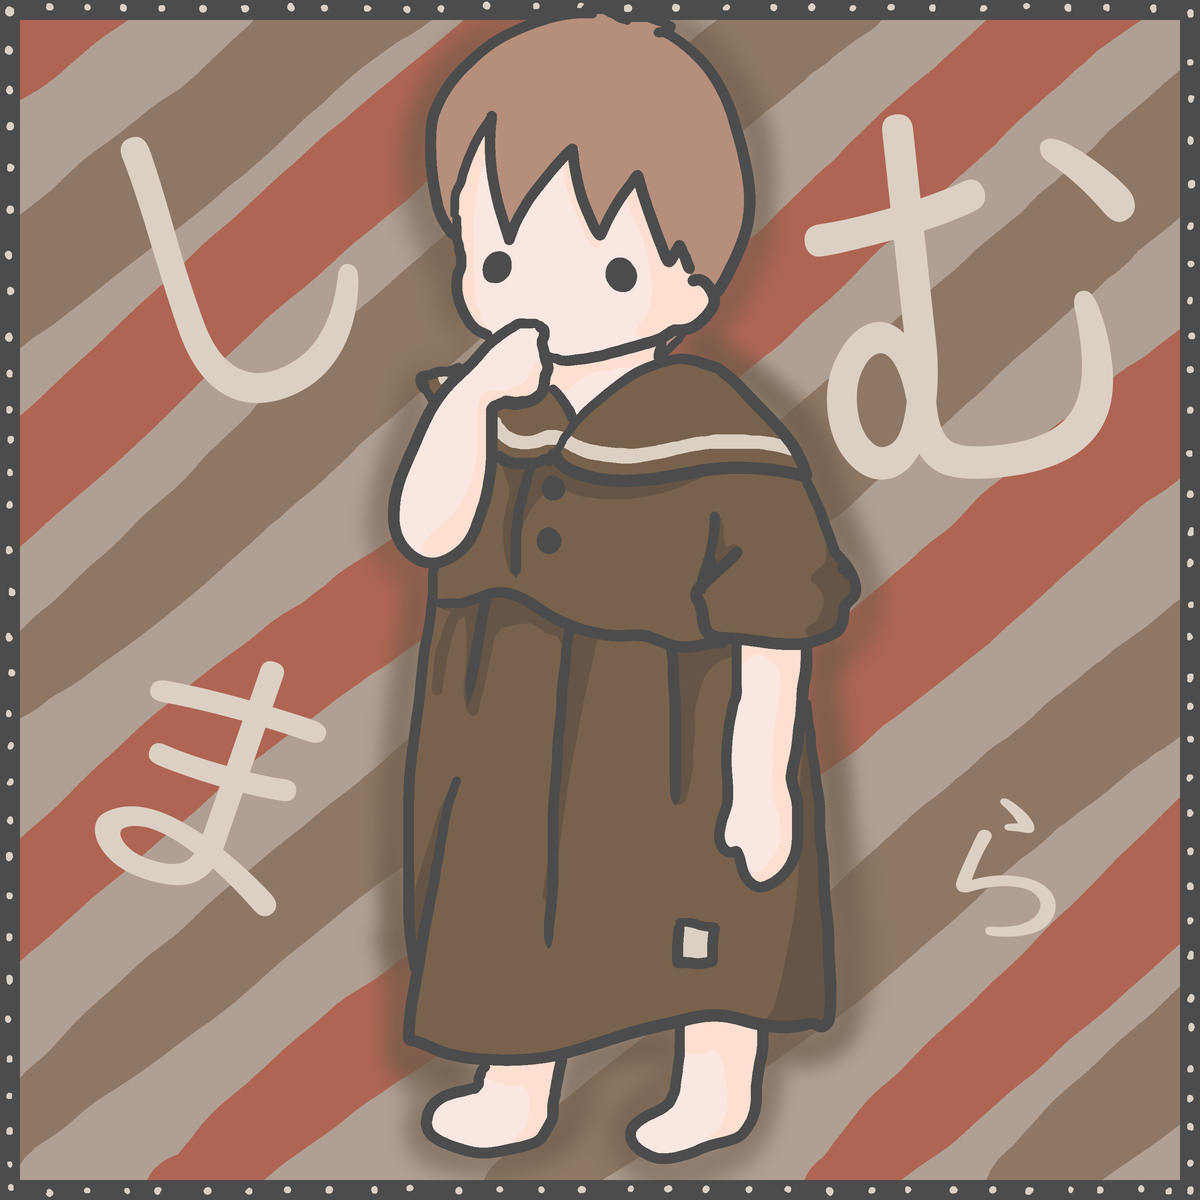 f:id:ika_yoshi:20201205222859j:plain